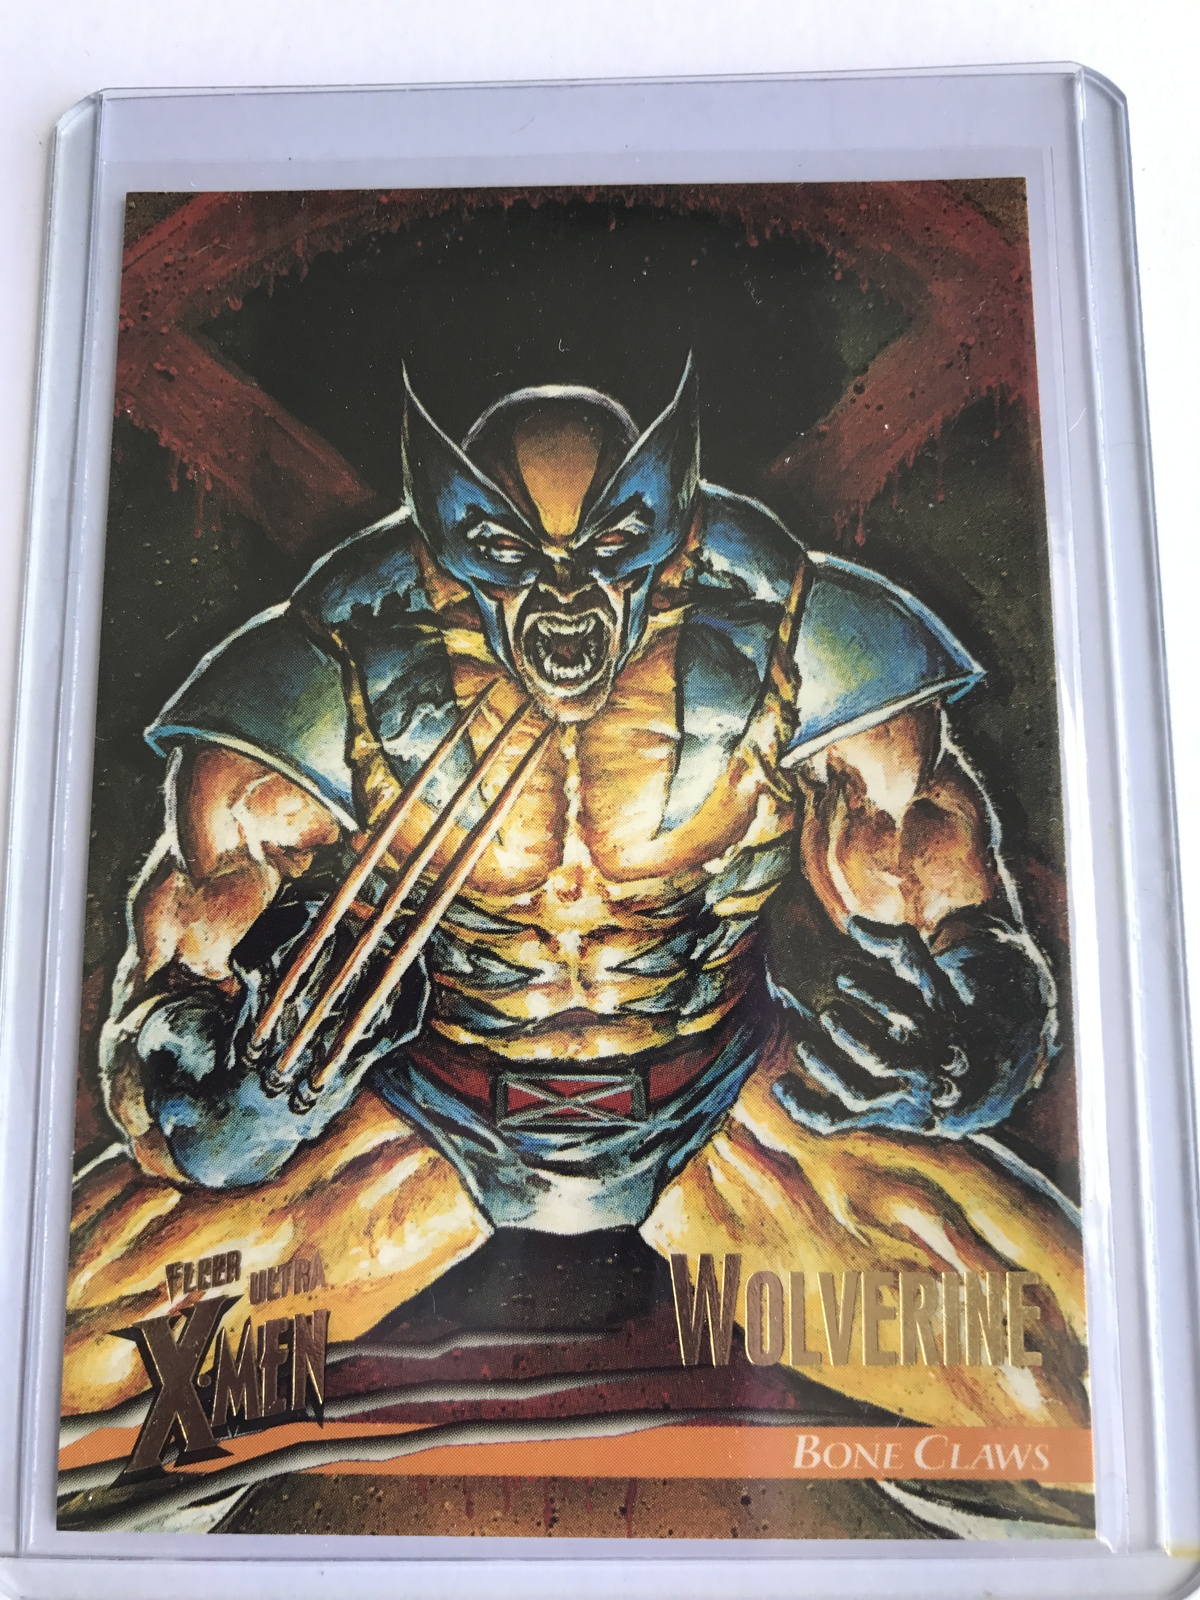 Fleer Ultra X-men Promo Card  Wolverine Bone claws  Trading Card